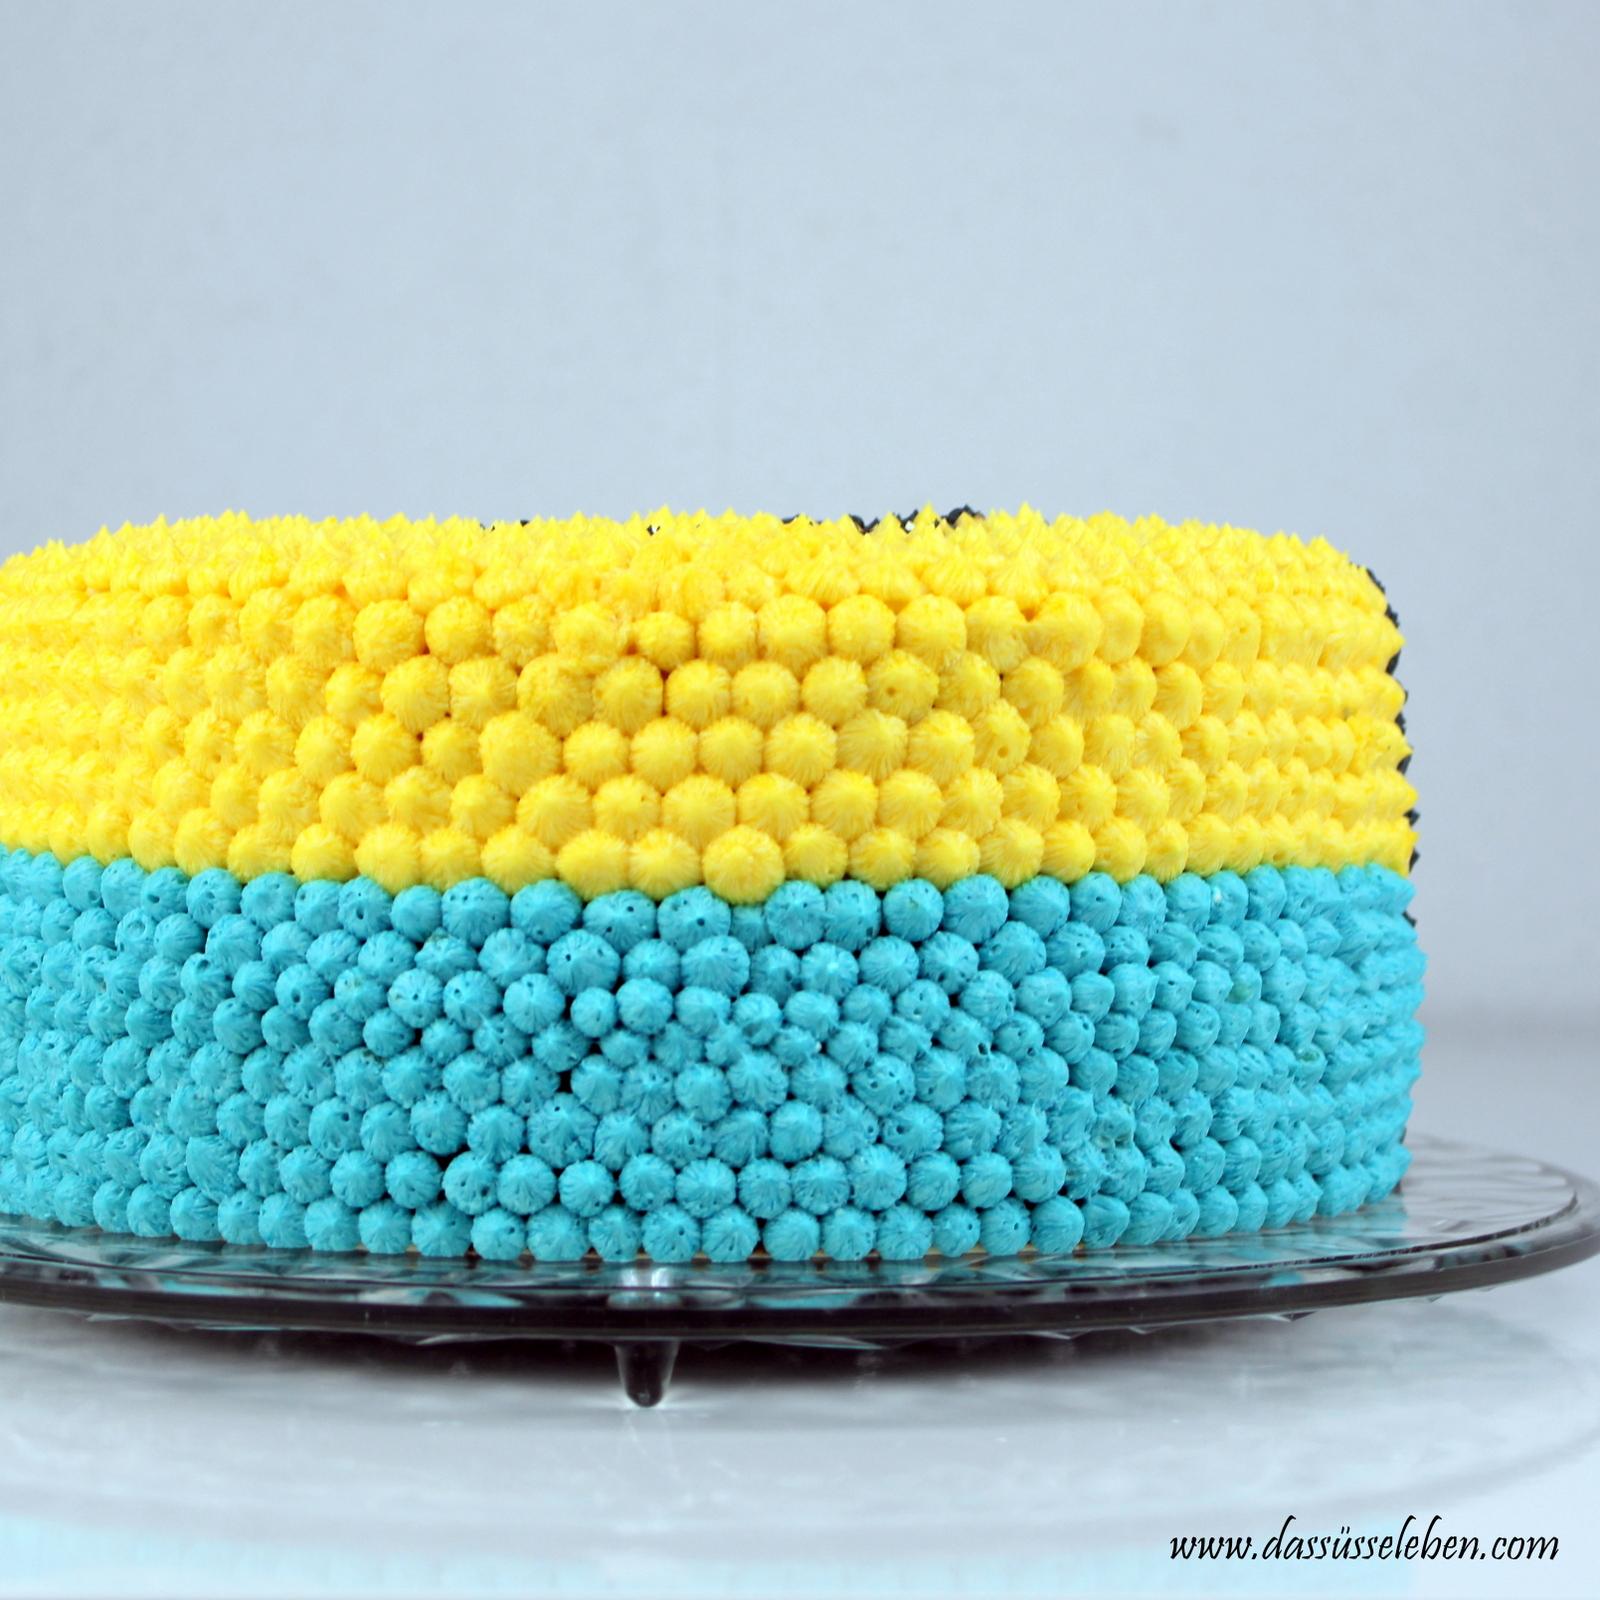 Rezept Minion Torte Aus Buttercreme Das Süße Leben